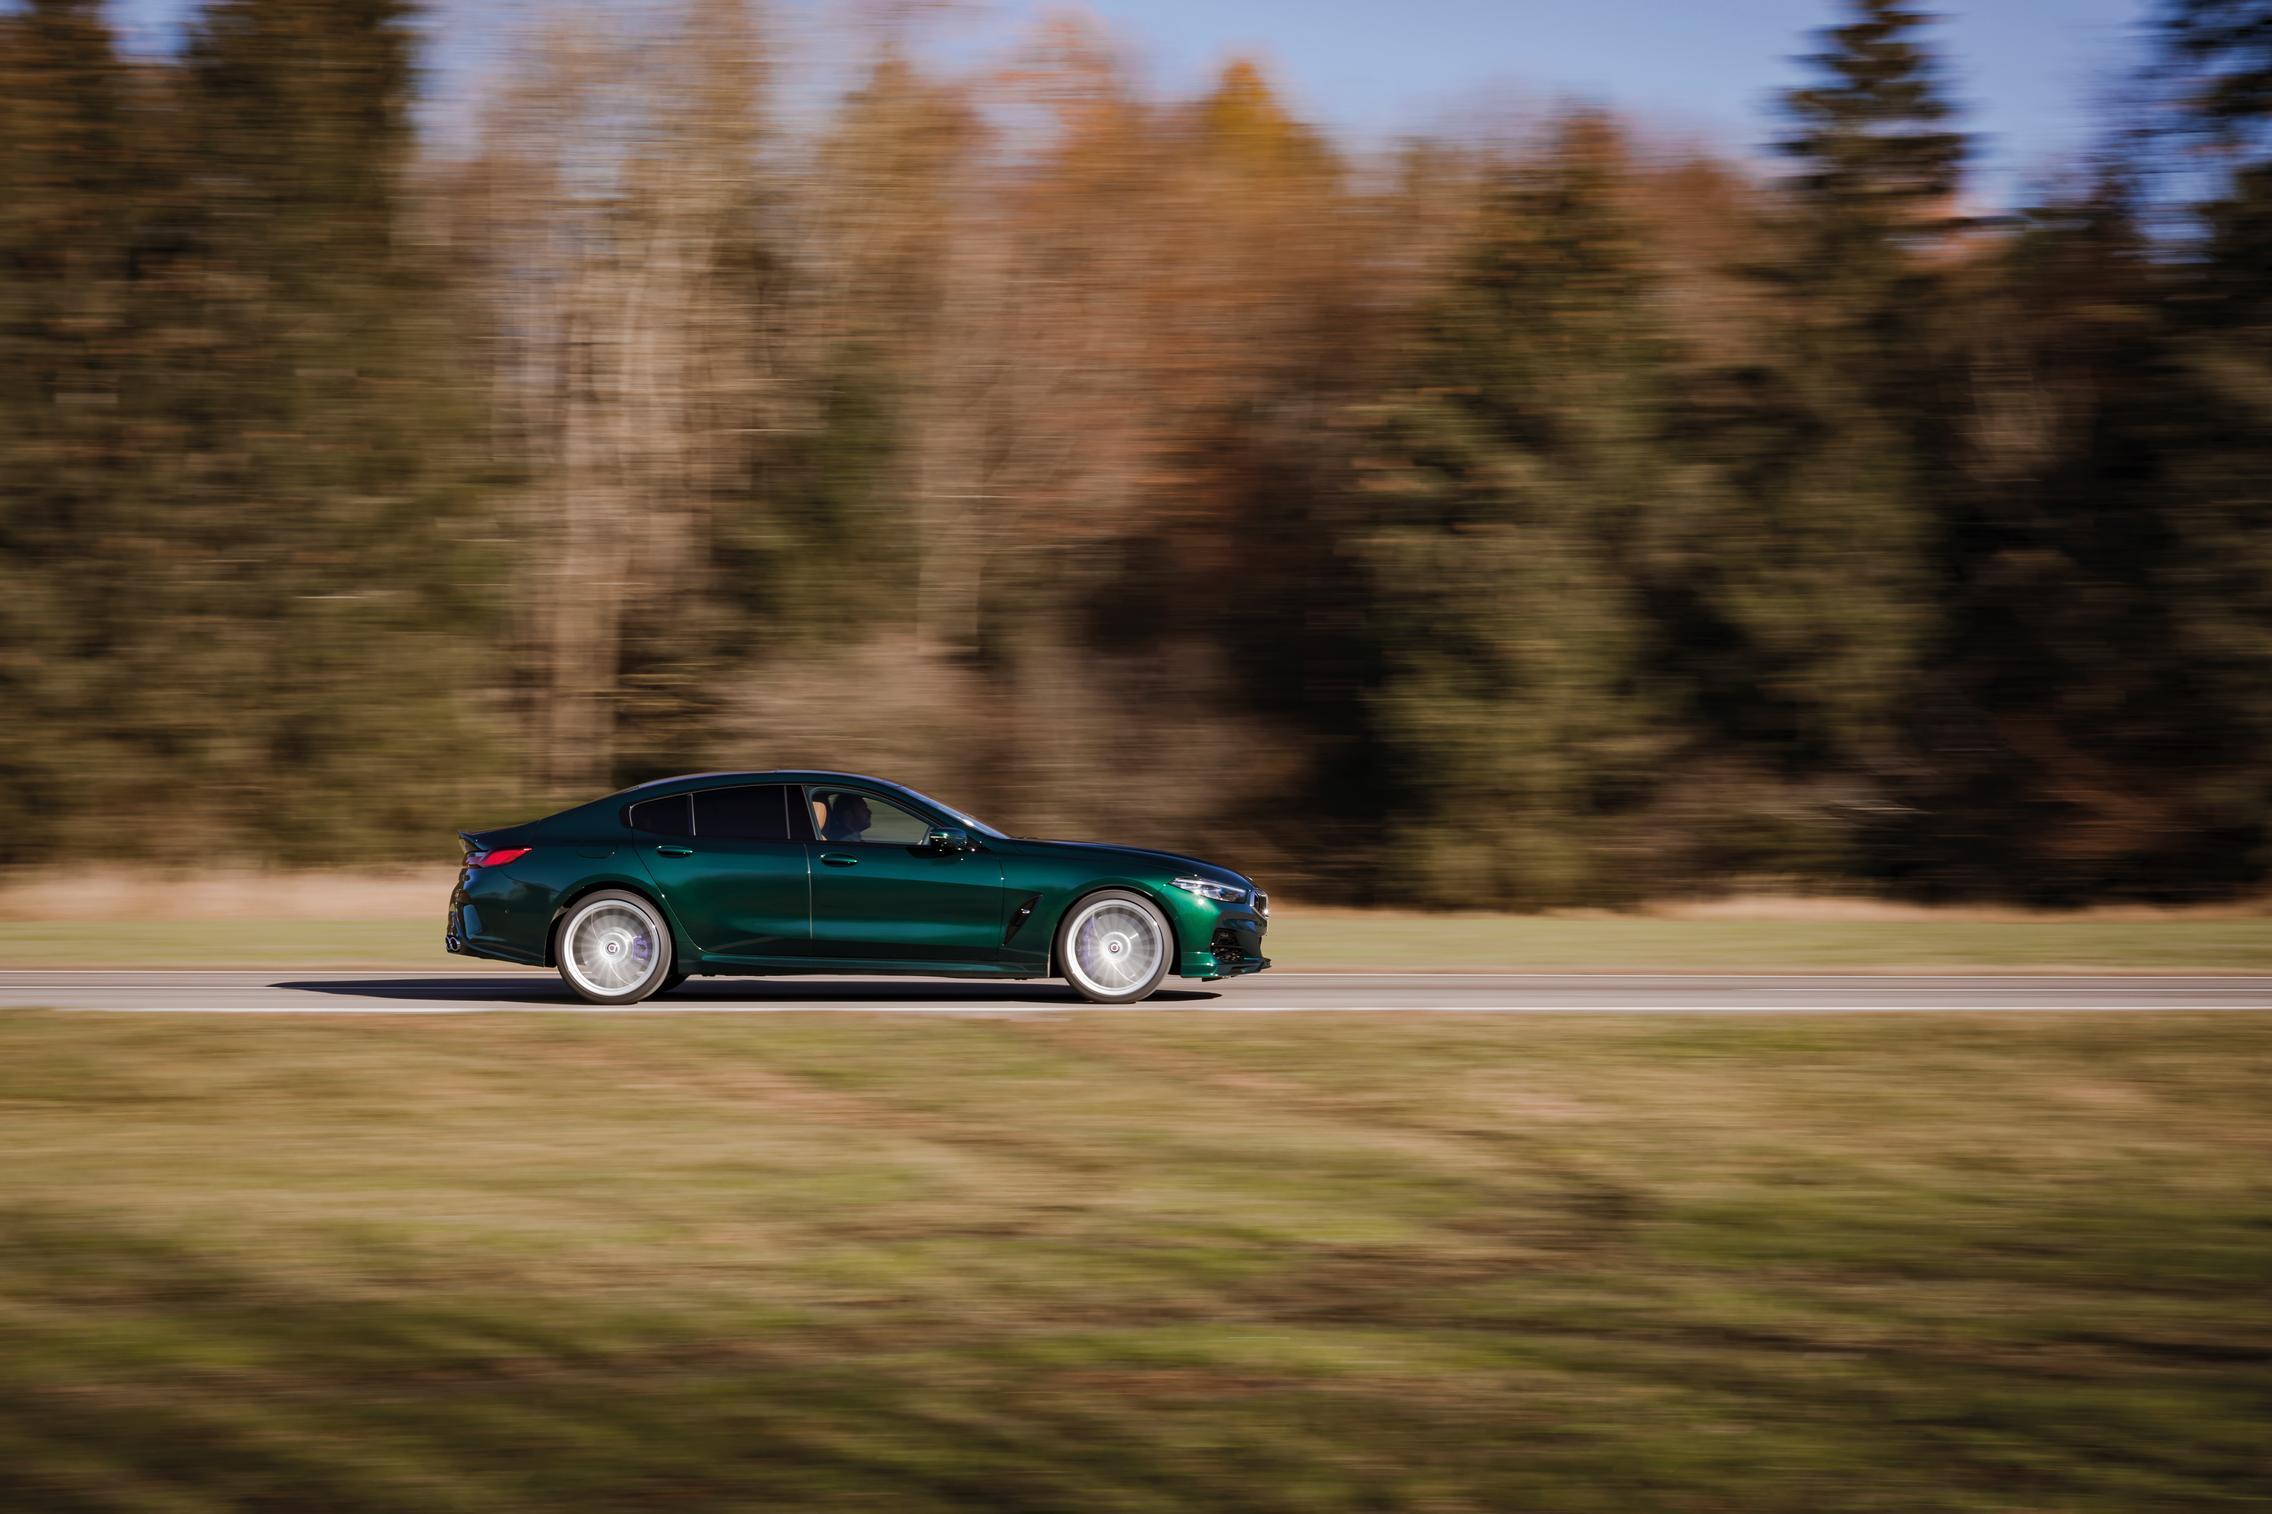 BMW-Alpina-B8-Gran-Coupe-side